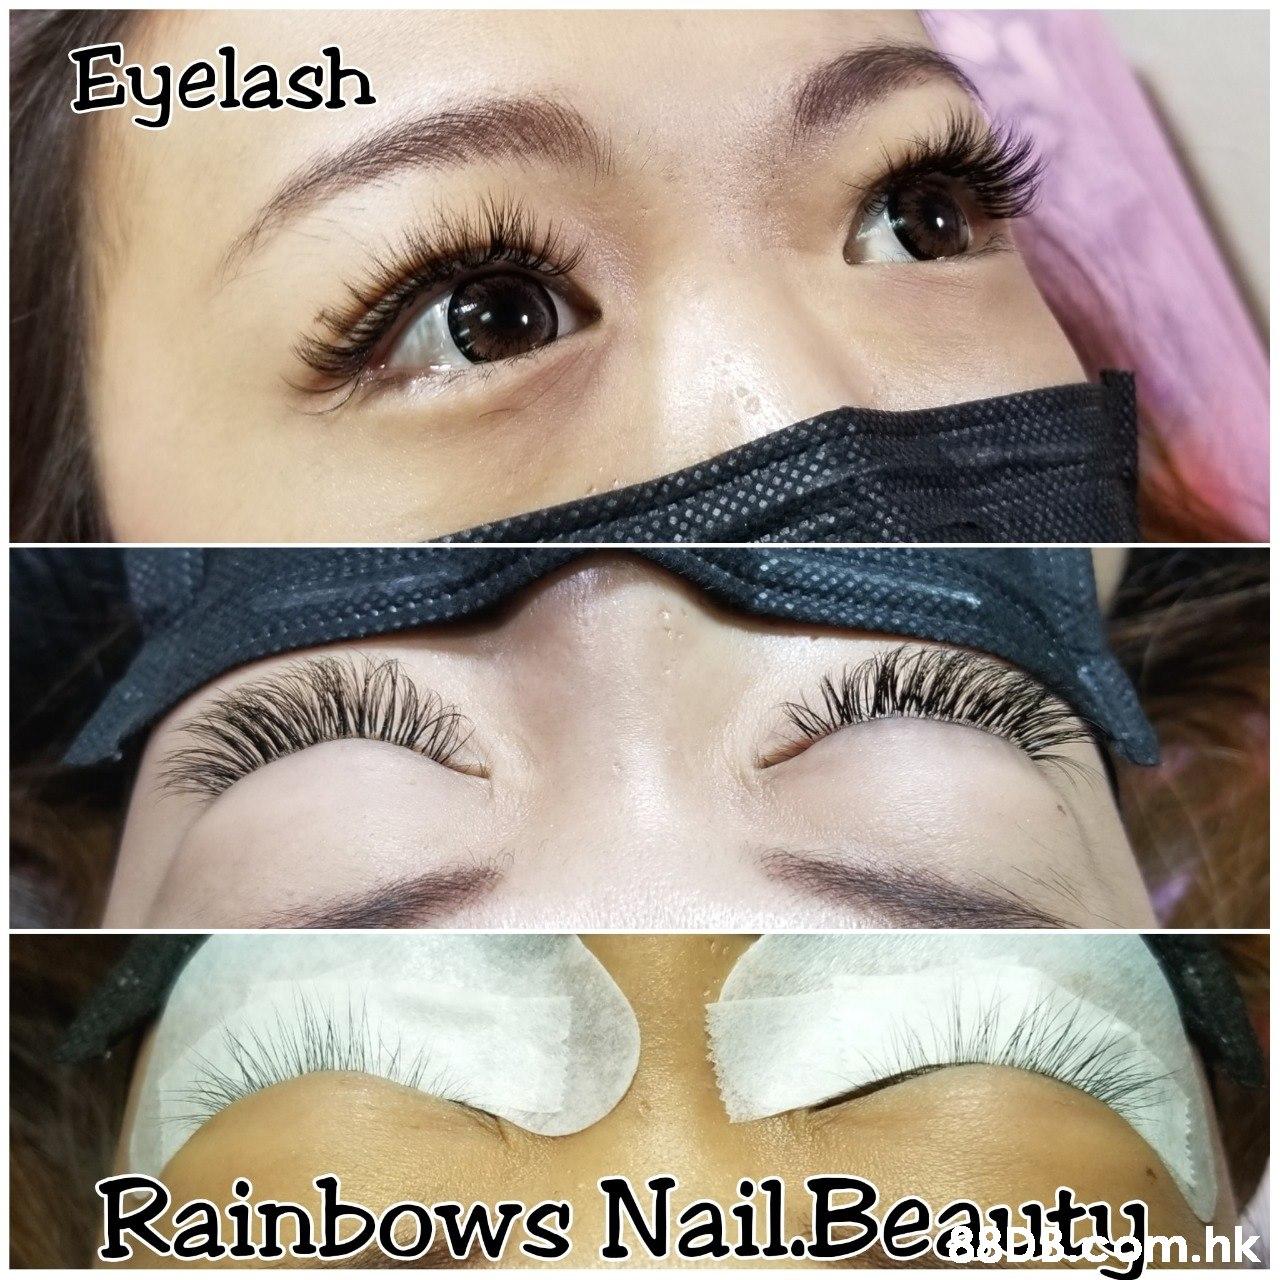 Euelash Rainbows Nail.Beasta hk  Eyebrow,Eyelash,Eye,Face,Skin